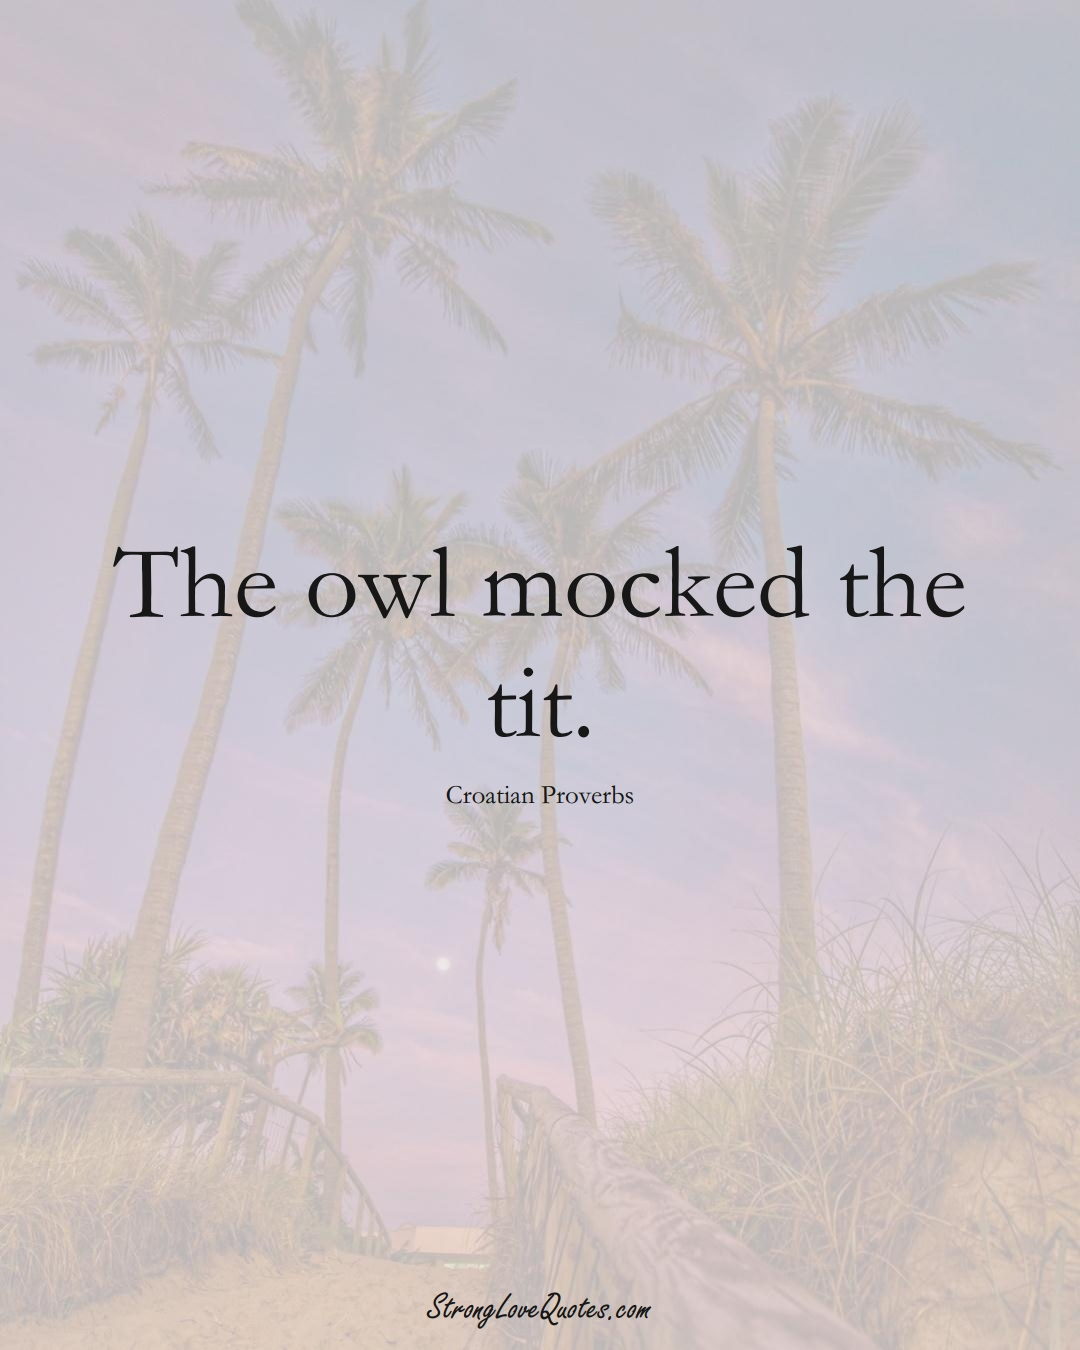 The owl mocked the tit. (Croatian Sayings);  #EuropeanSayings